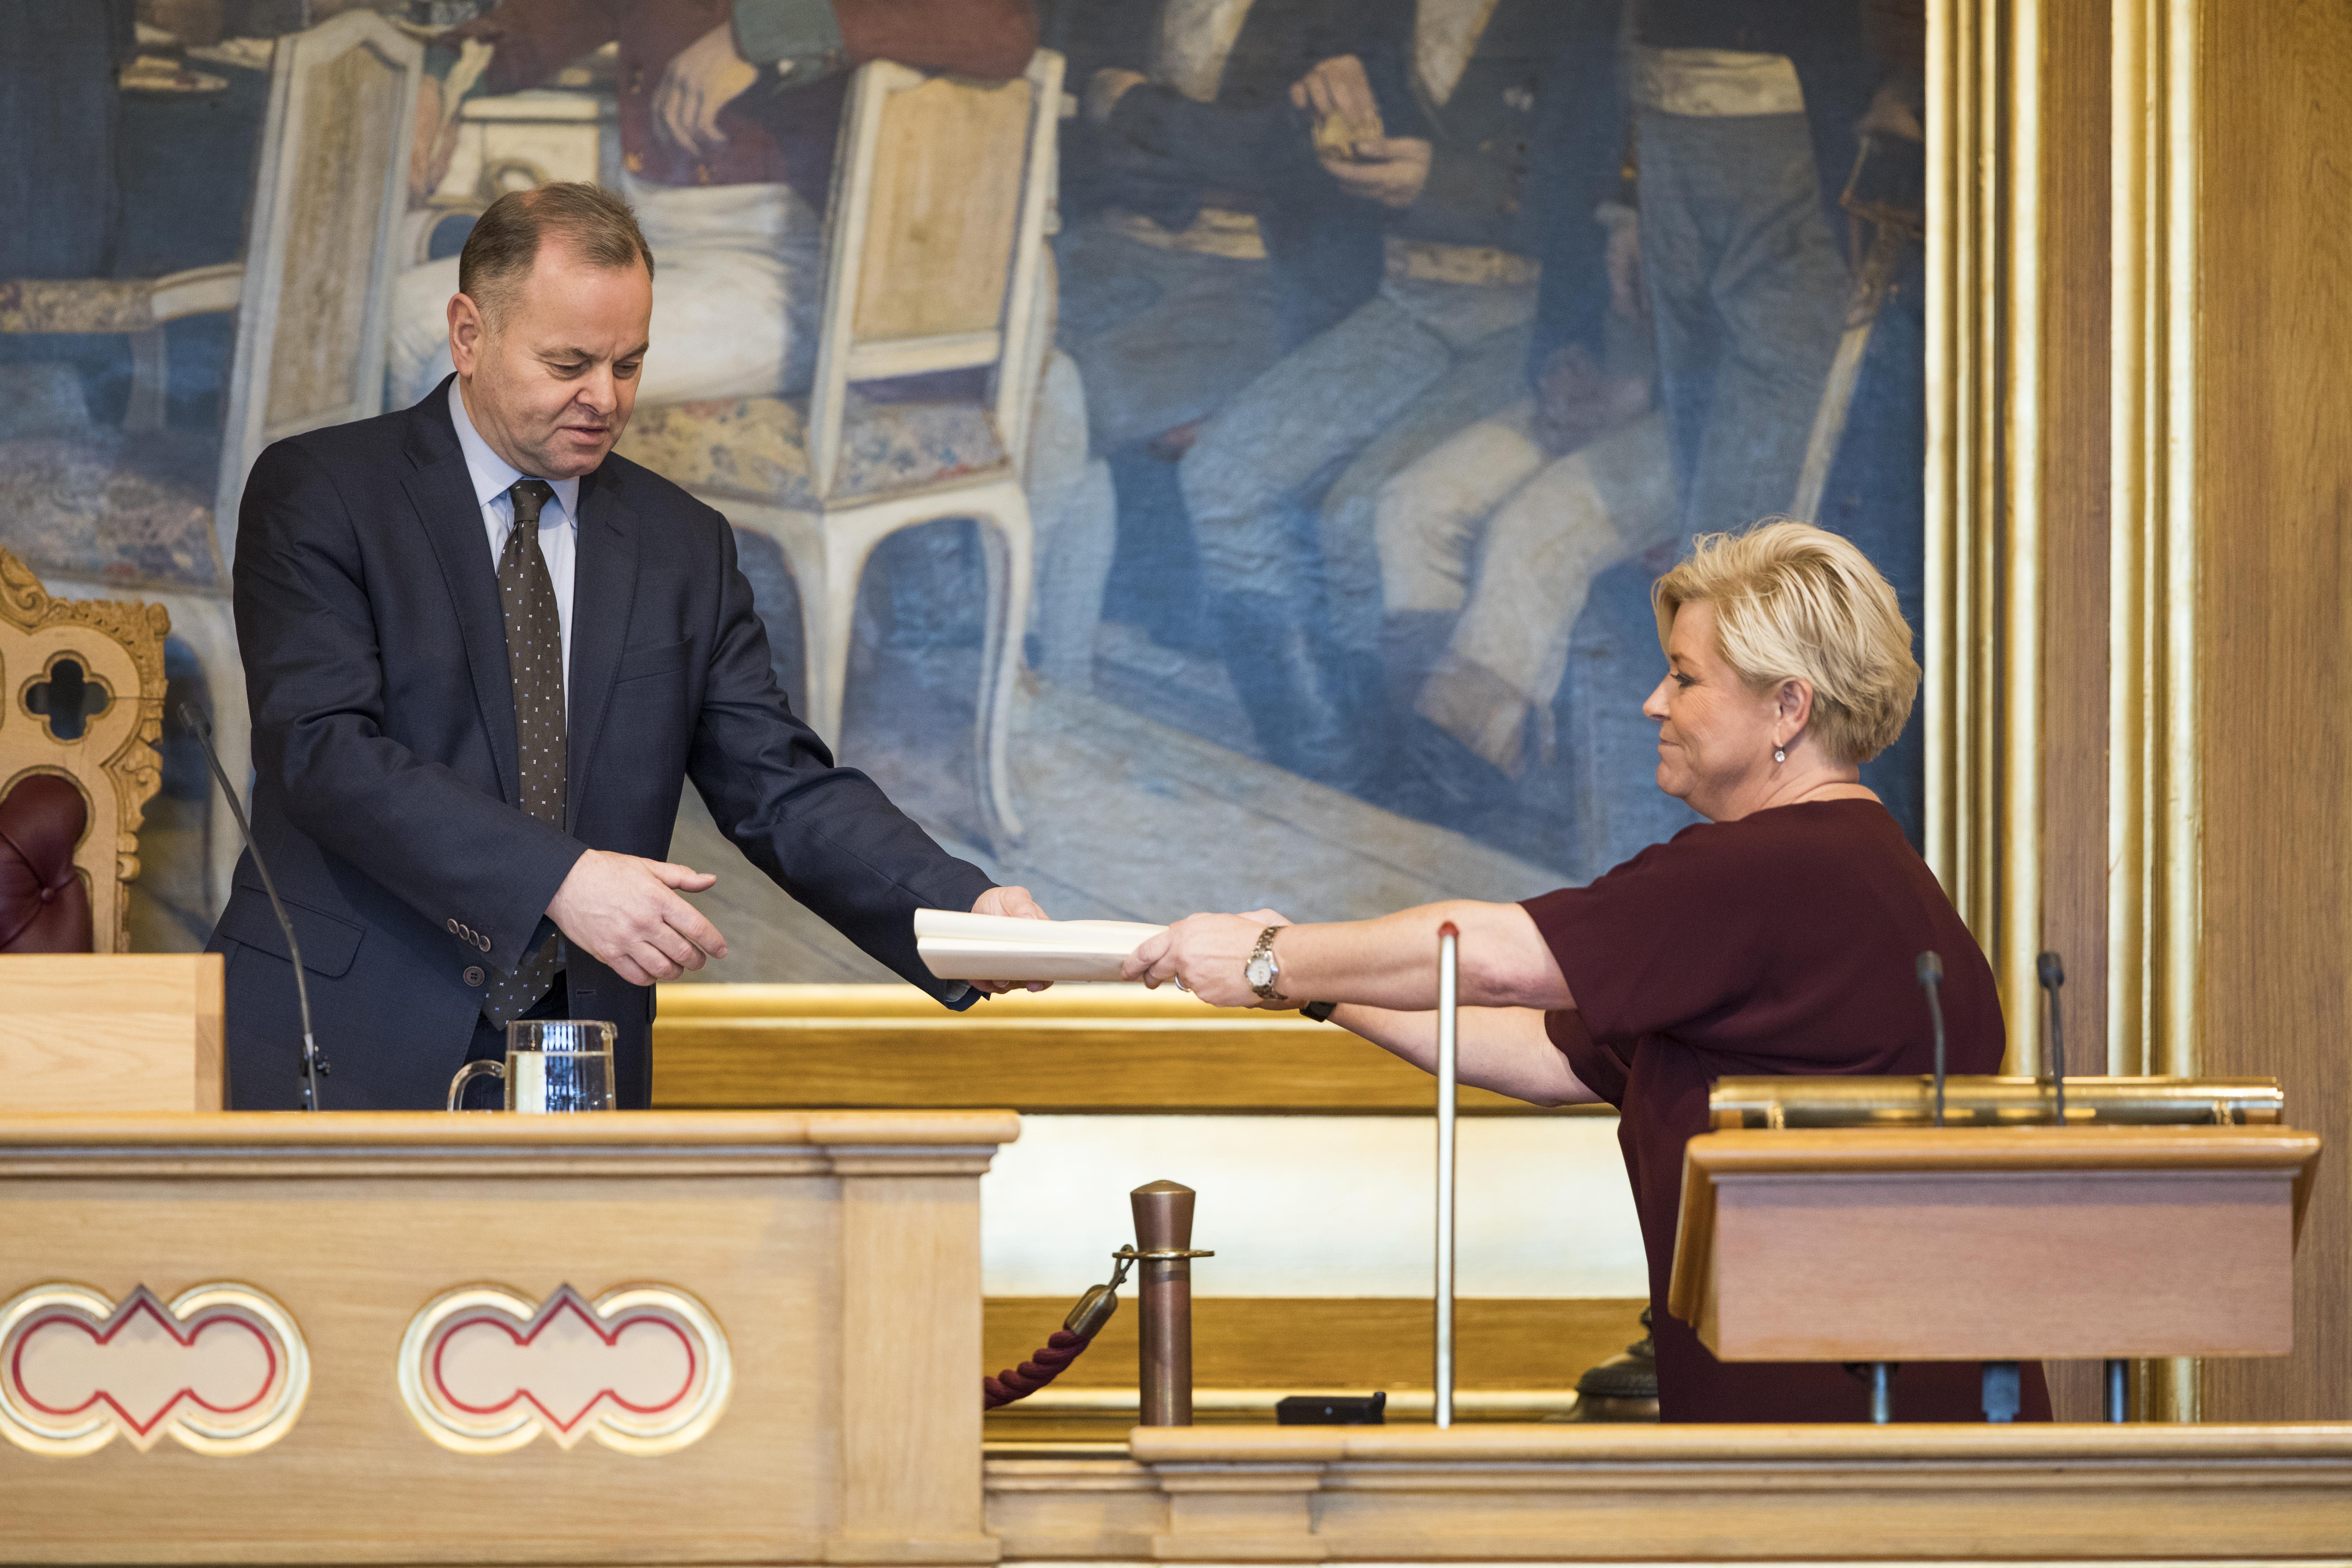 Statsbudsjettet 2018: Foreslår 7 millioner i tilskudd til kvensk språk og kultur